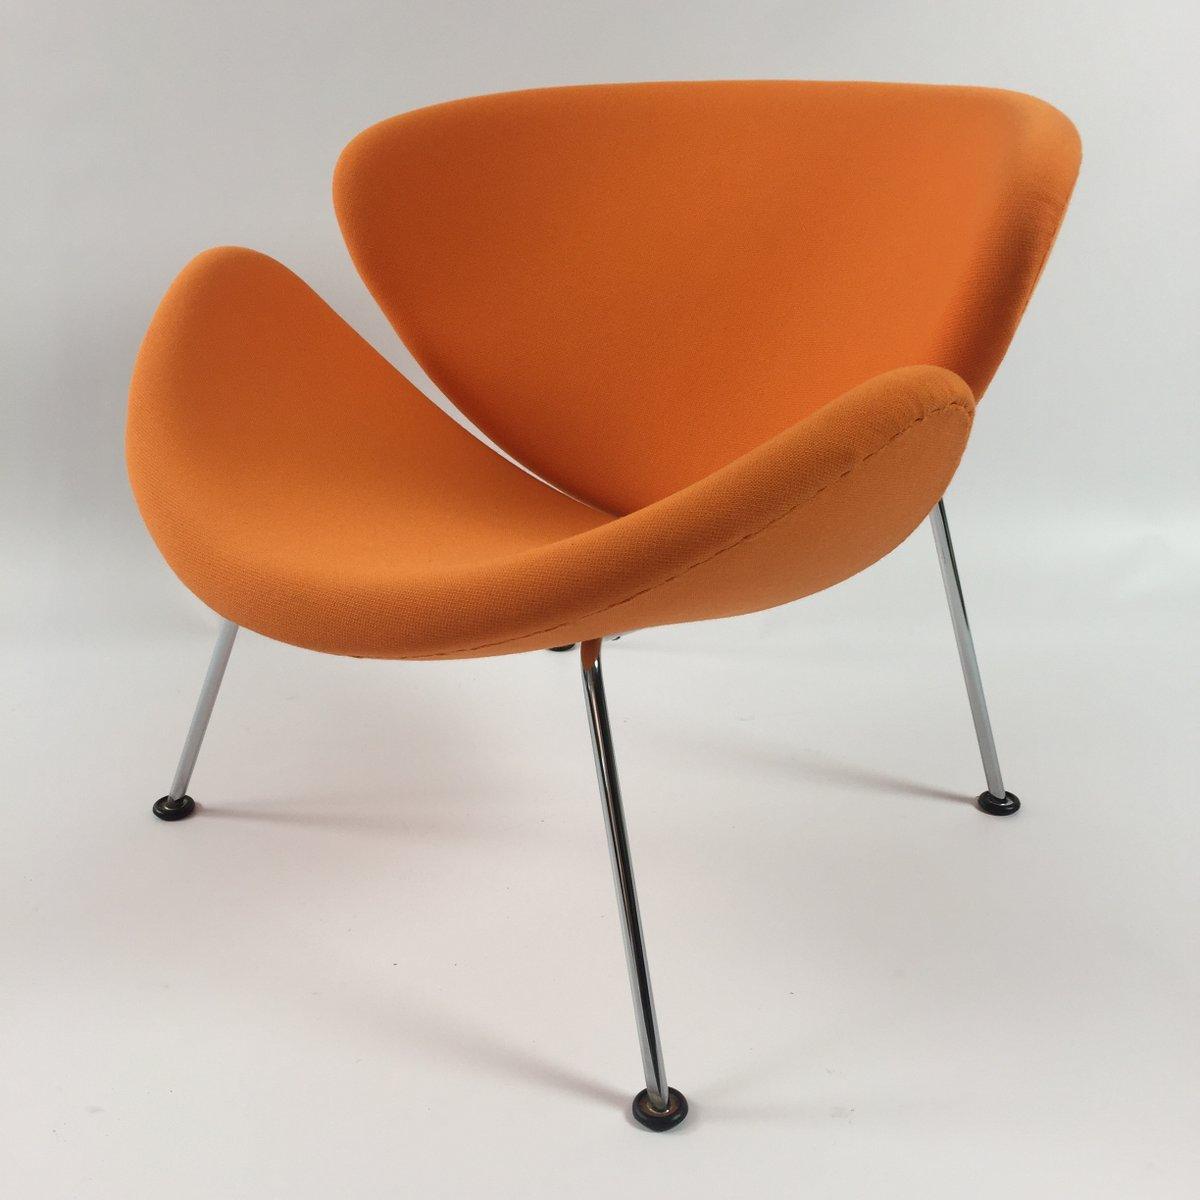 vintage orange slice lounge chair by pierre paulin for. Black Bedroom Furniture Sets. Home Design Ideas